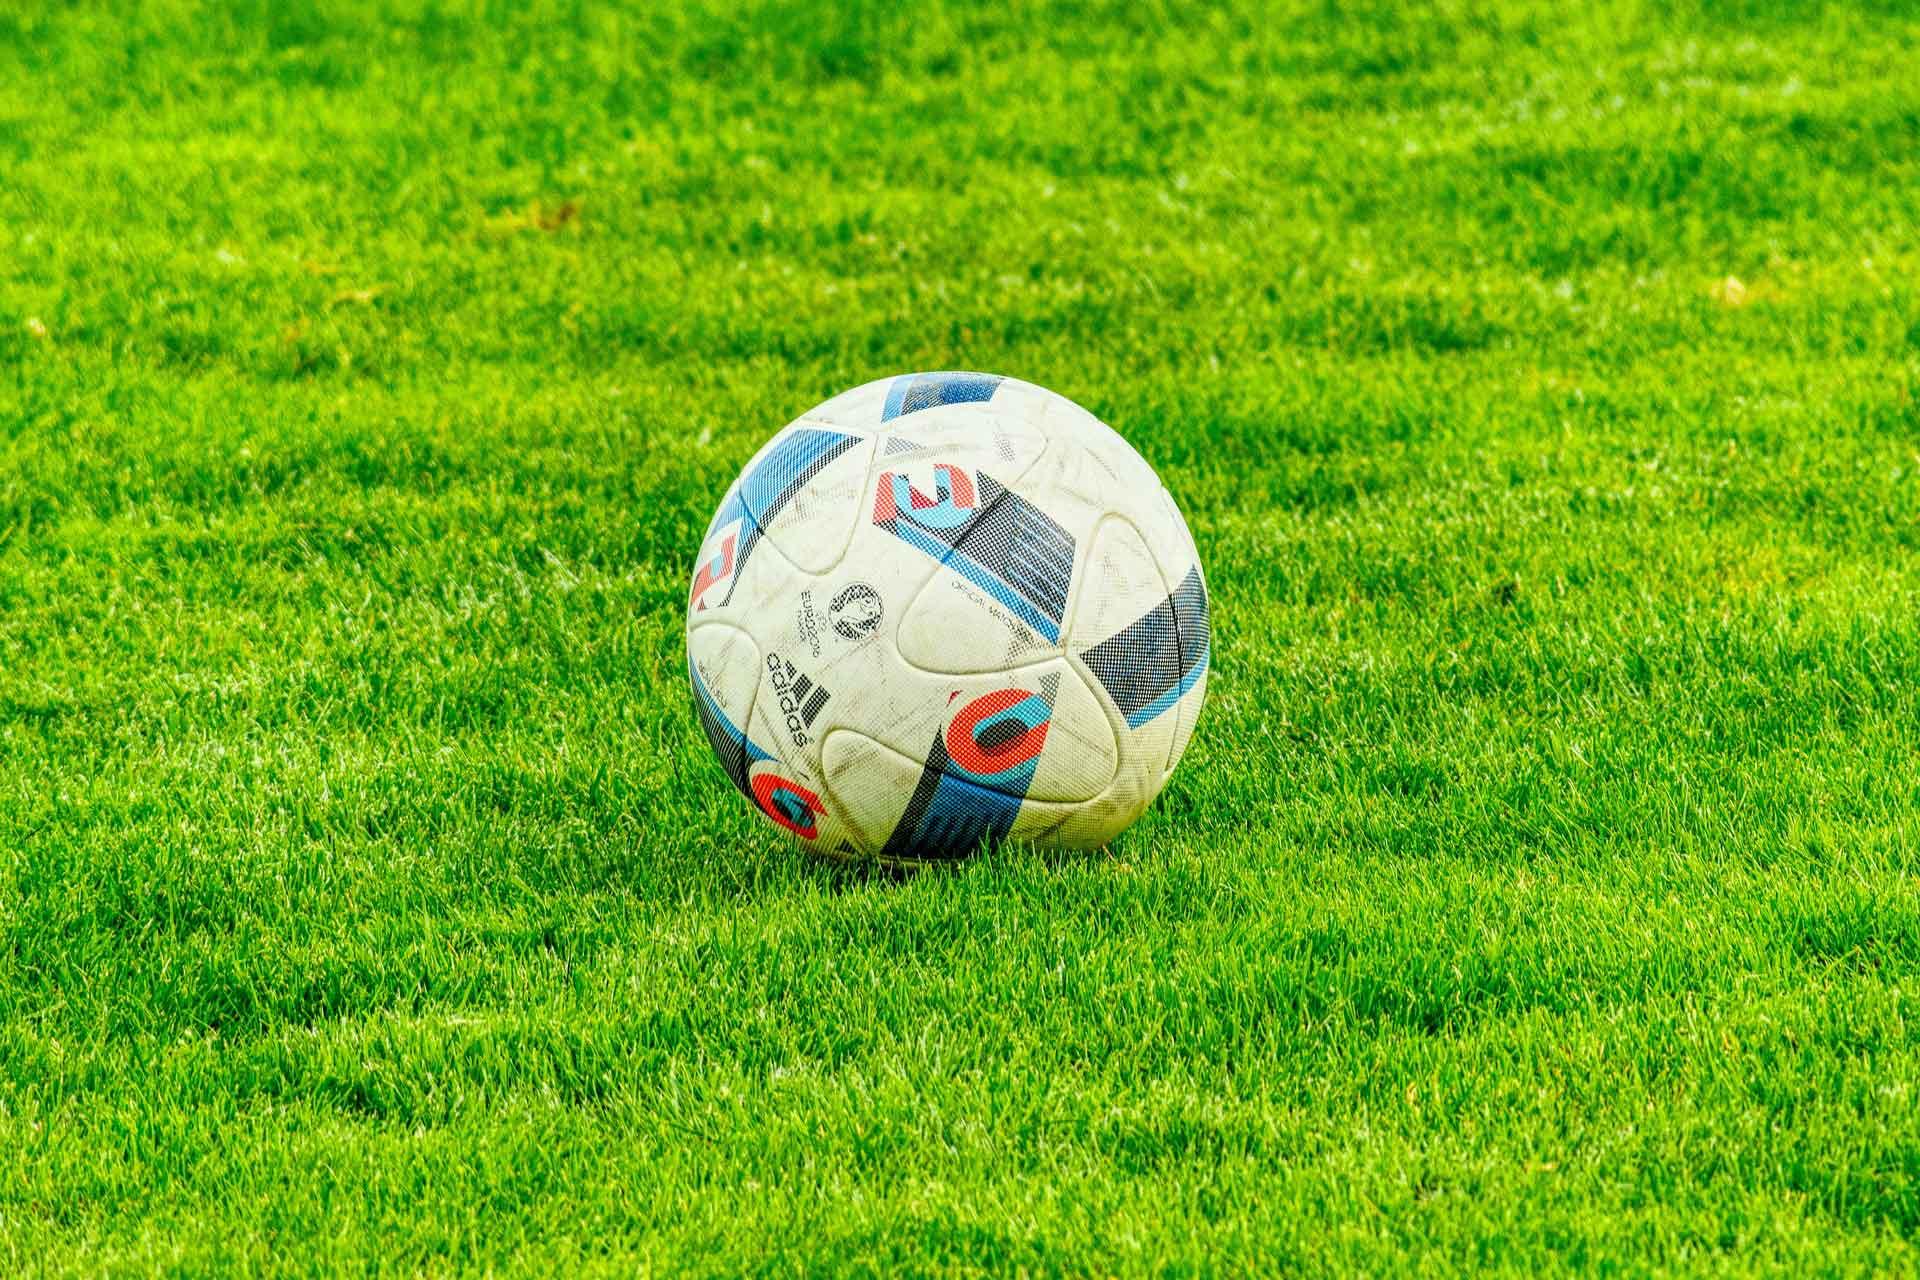 F-Jugend: Turnier zu NULL & Neuzugang trifft!